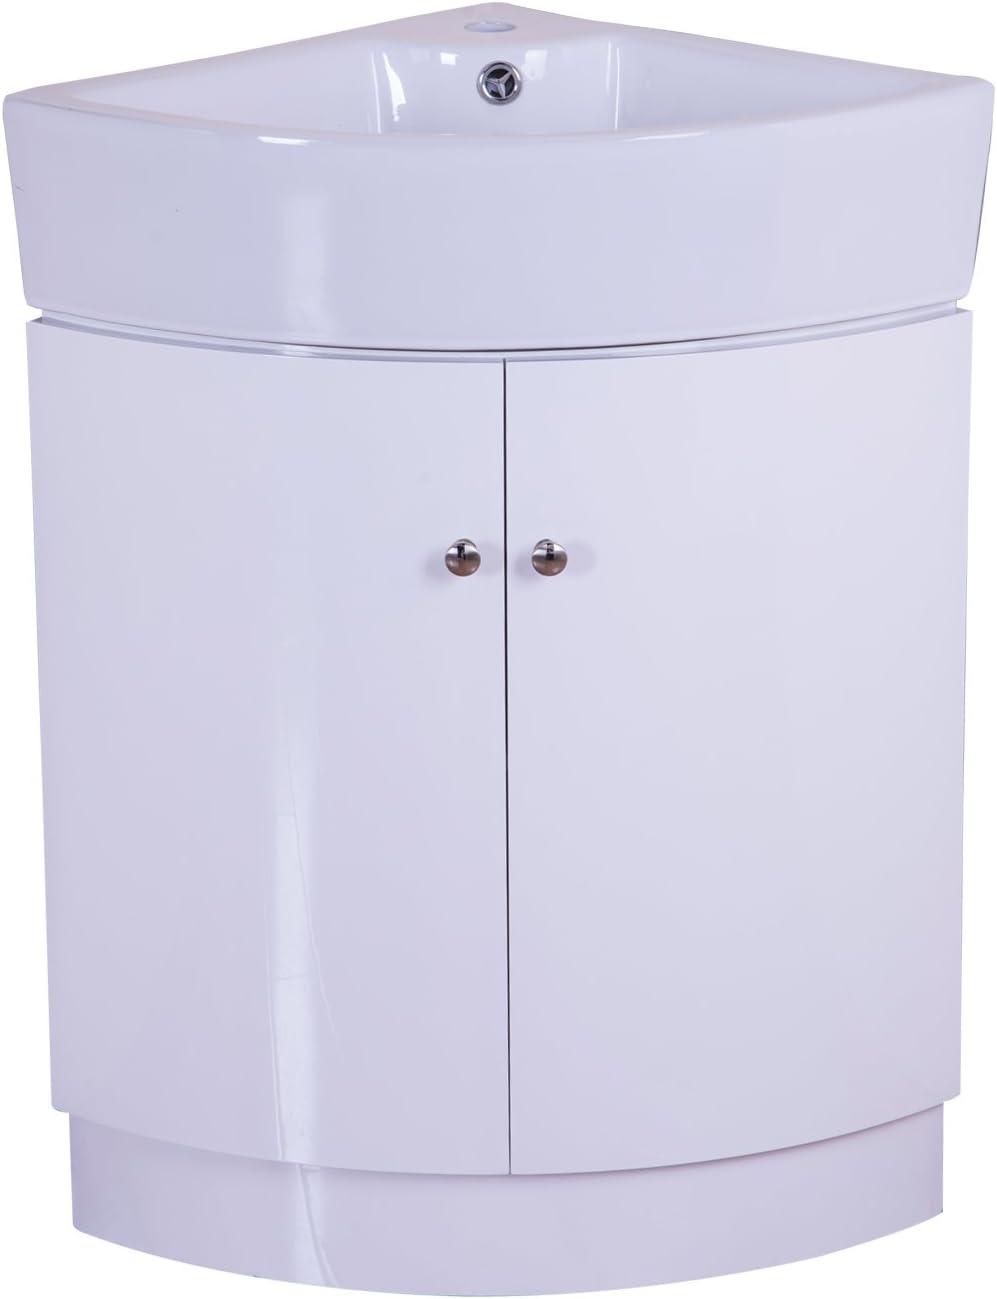 Homcom 650mm Gloss White Corner Bathroom Vanity Unit Double Door Cabinet With Ceramic Sink Basin Bathroom Suite Storage Furniture Amazon Co Uk Kitchen Home